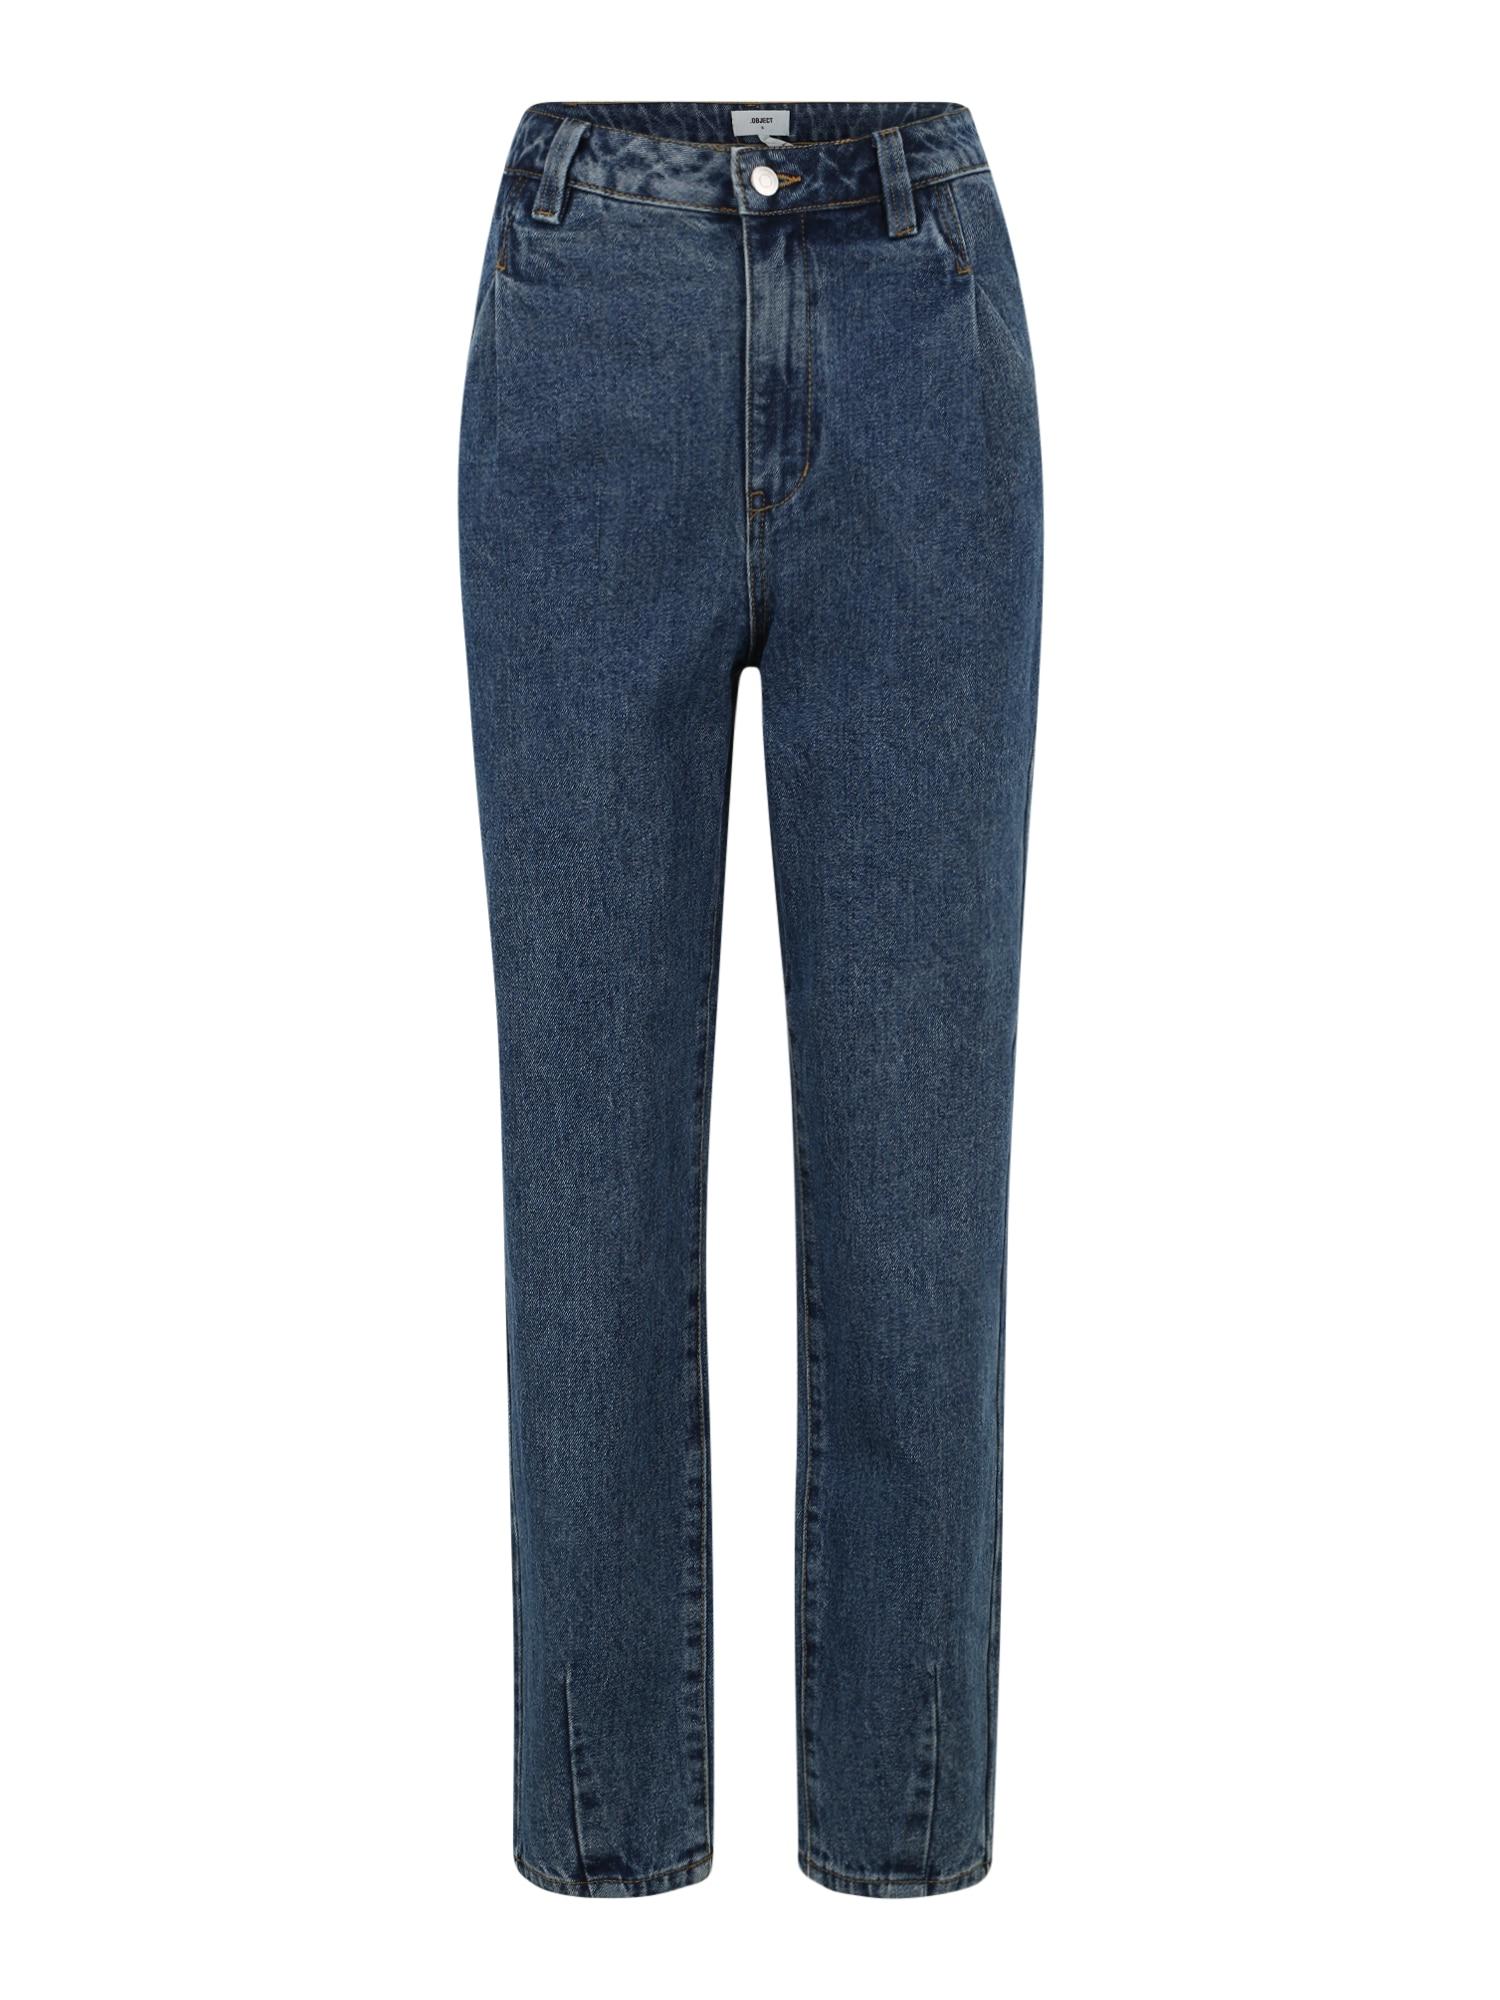 OBJECT (Tall) Džinsai tamsiai (džinso) mėlyna